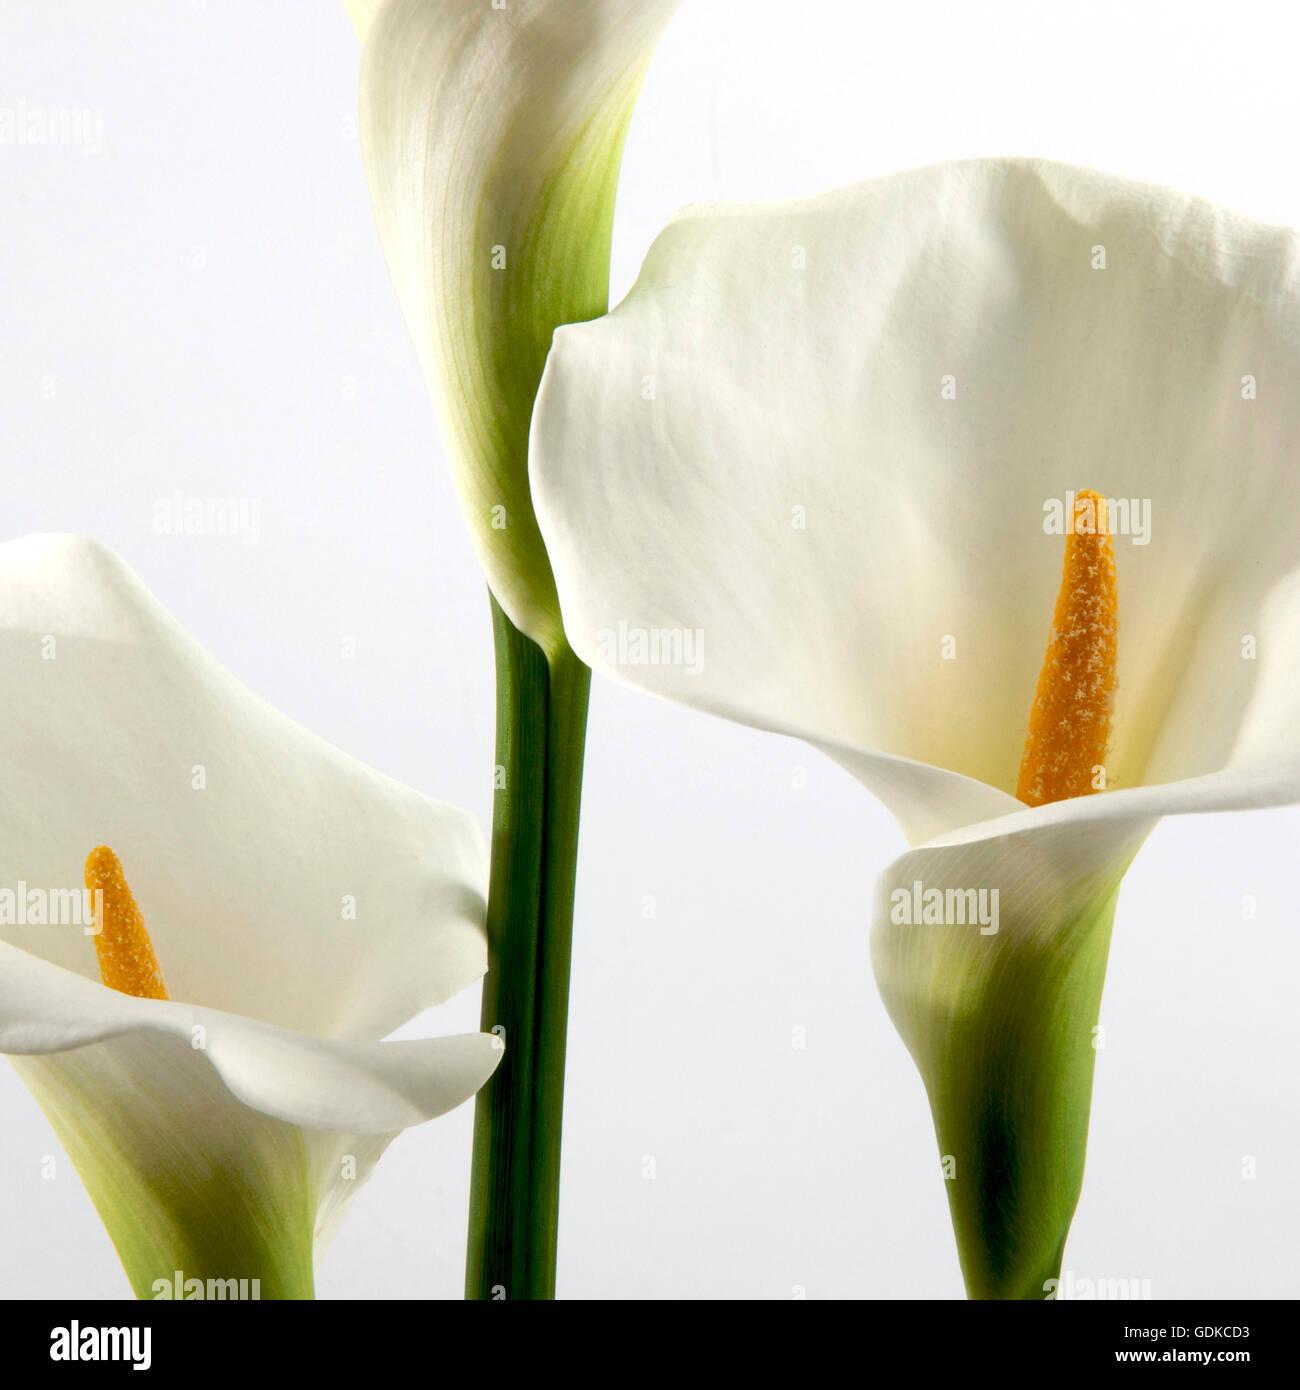 White arums (Araceae) - Stock Image